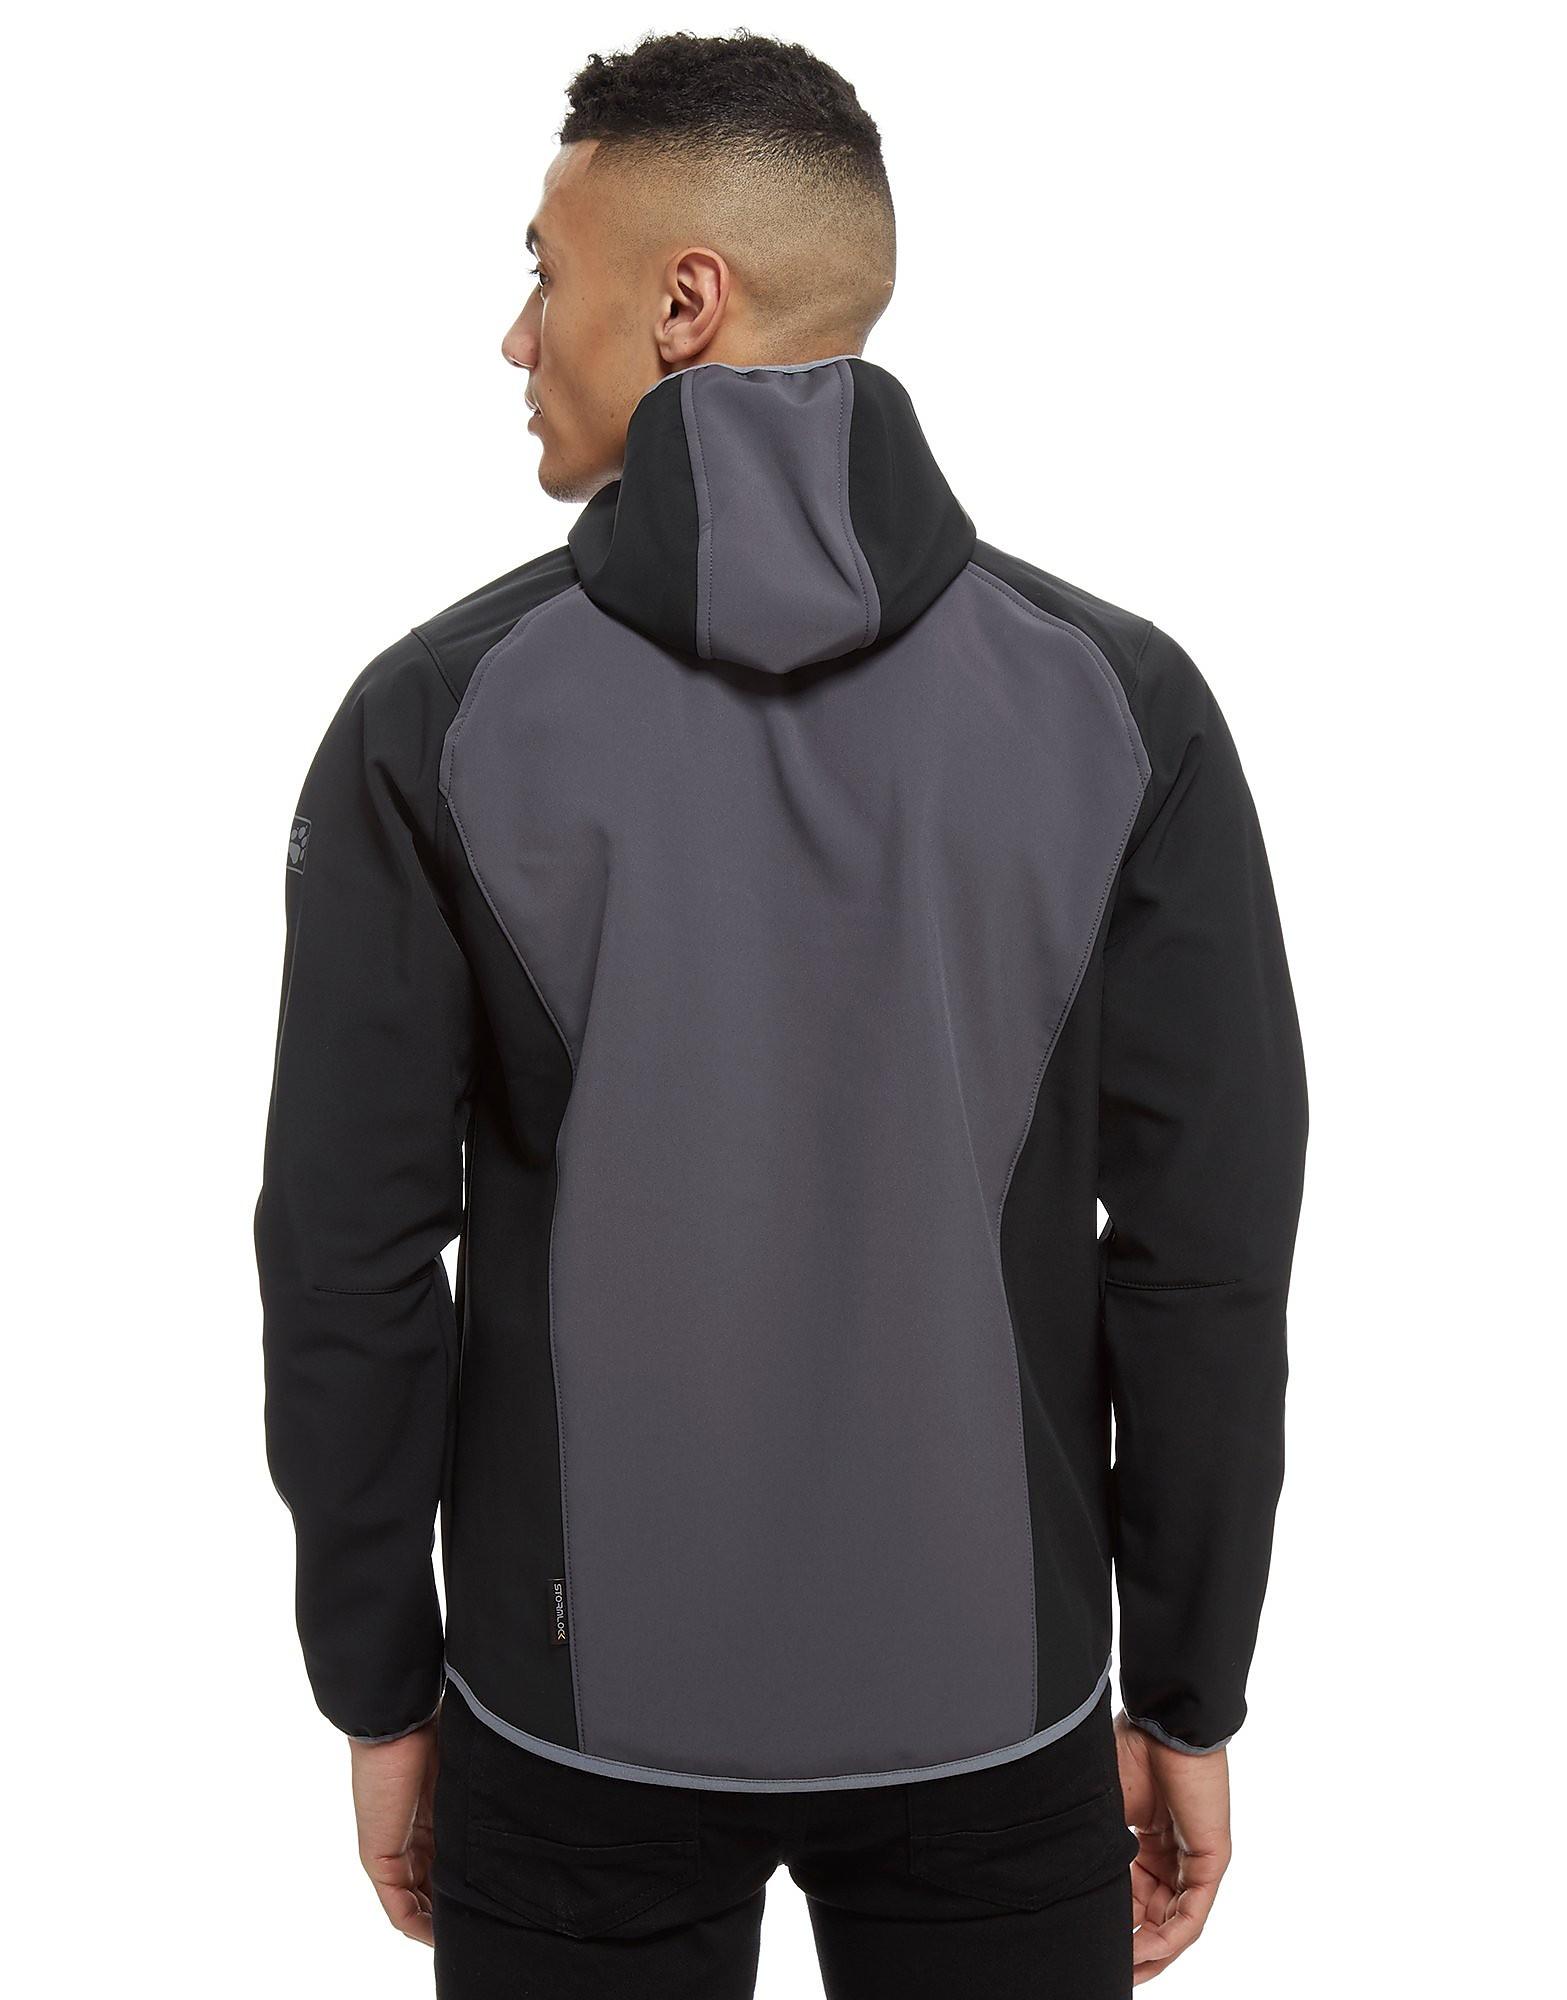 Jack Wolfskin Zenon Softshell Lightweight Jacket